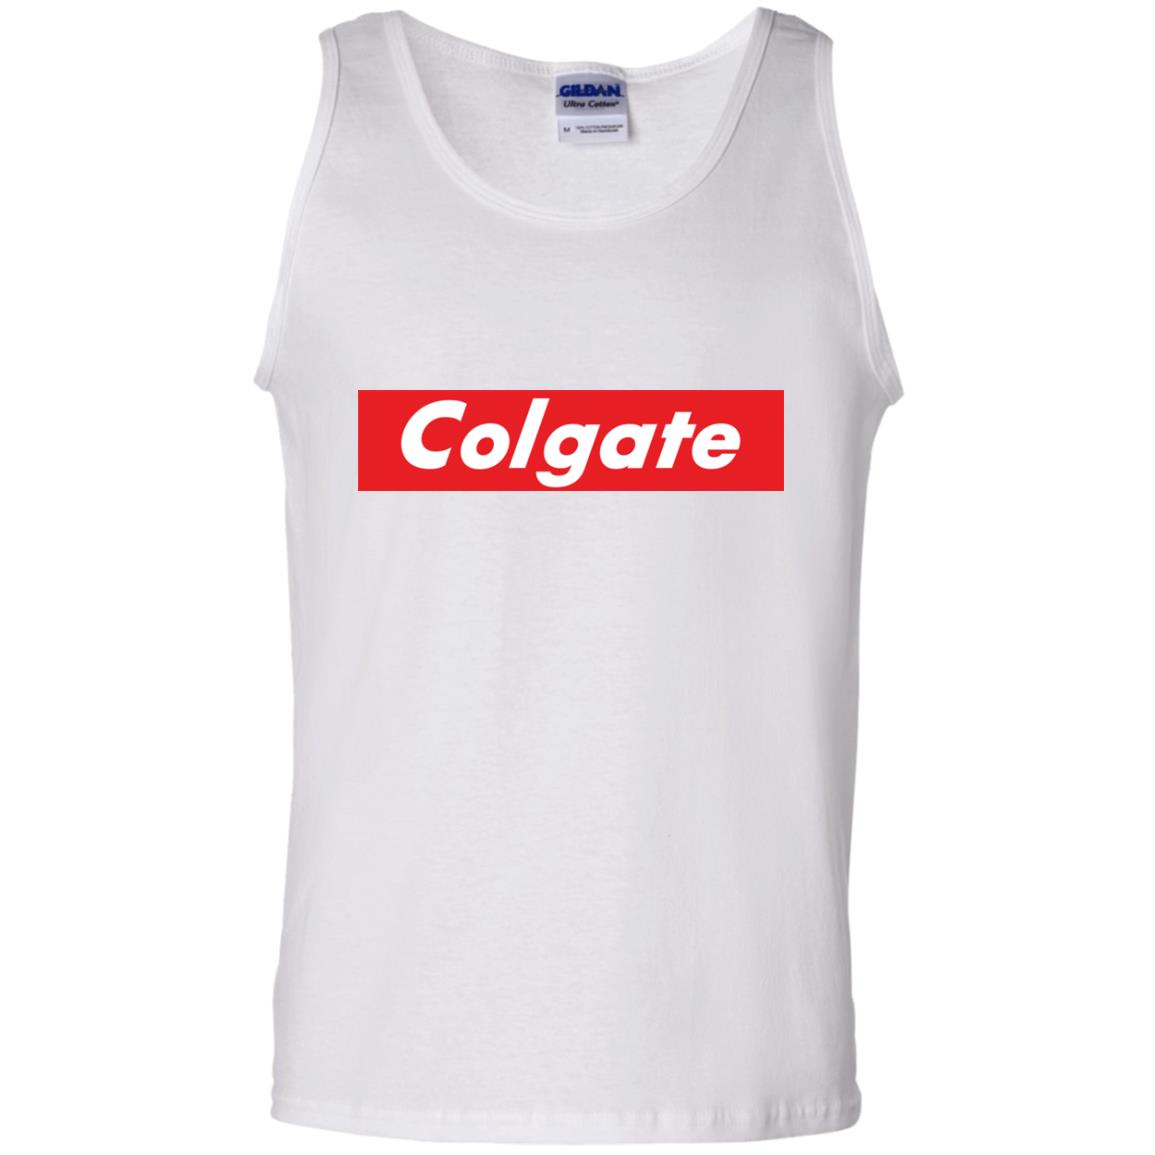 image 996px Supreme Colgate Shirt, Hoodies, Tank